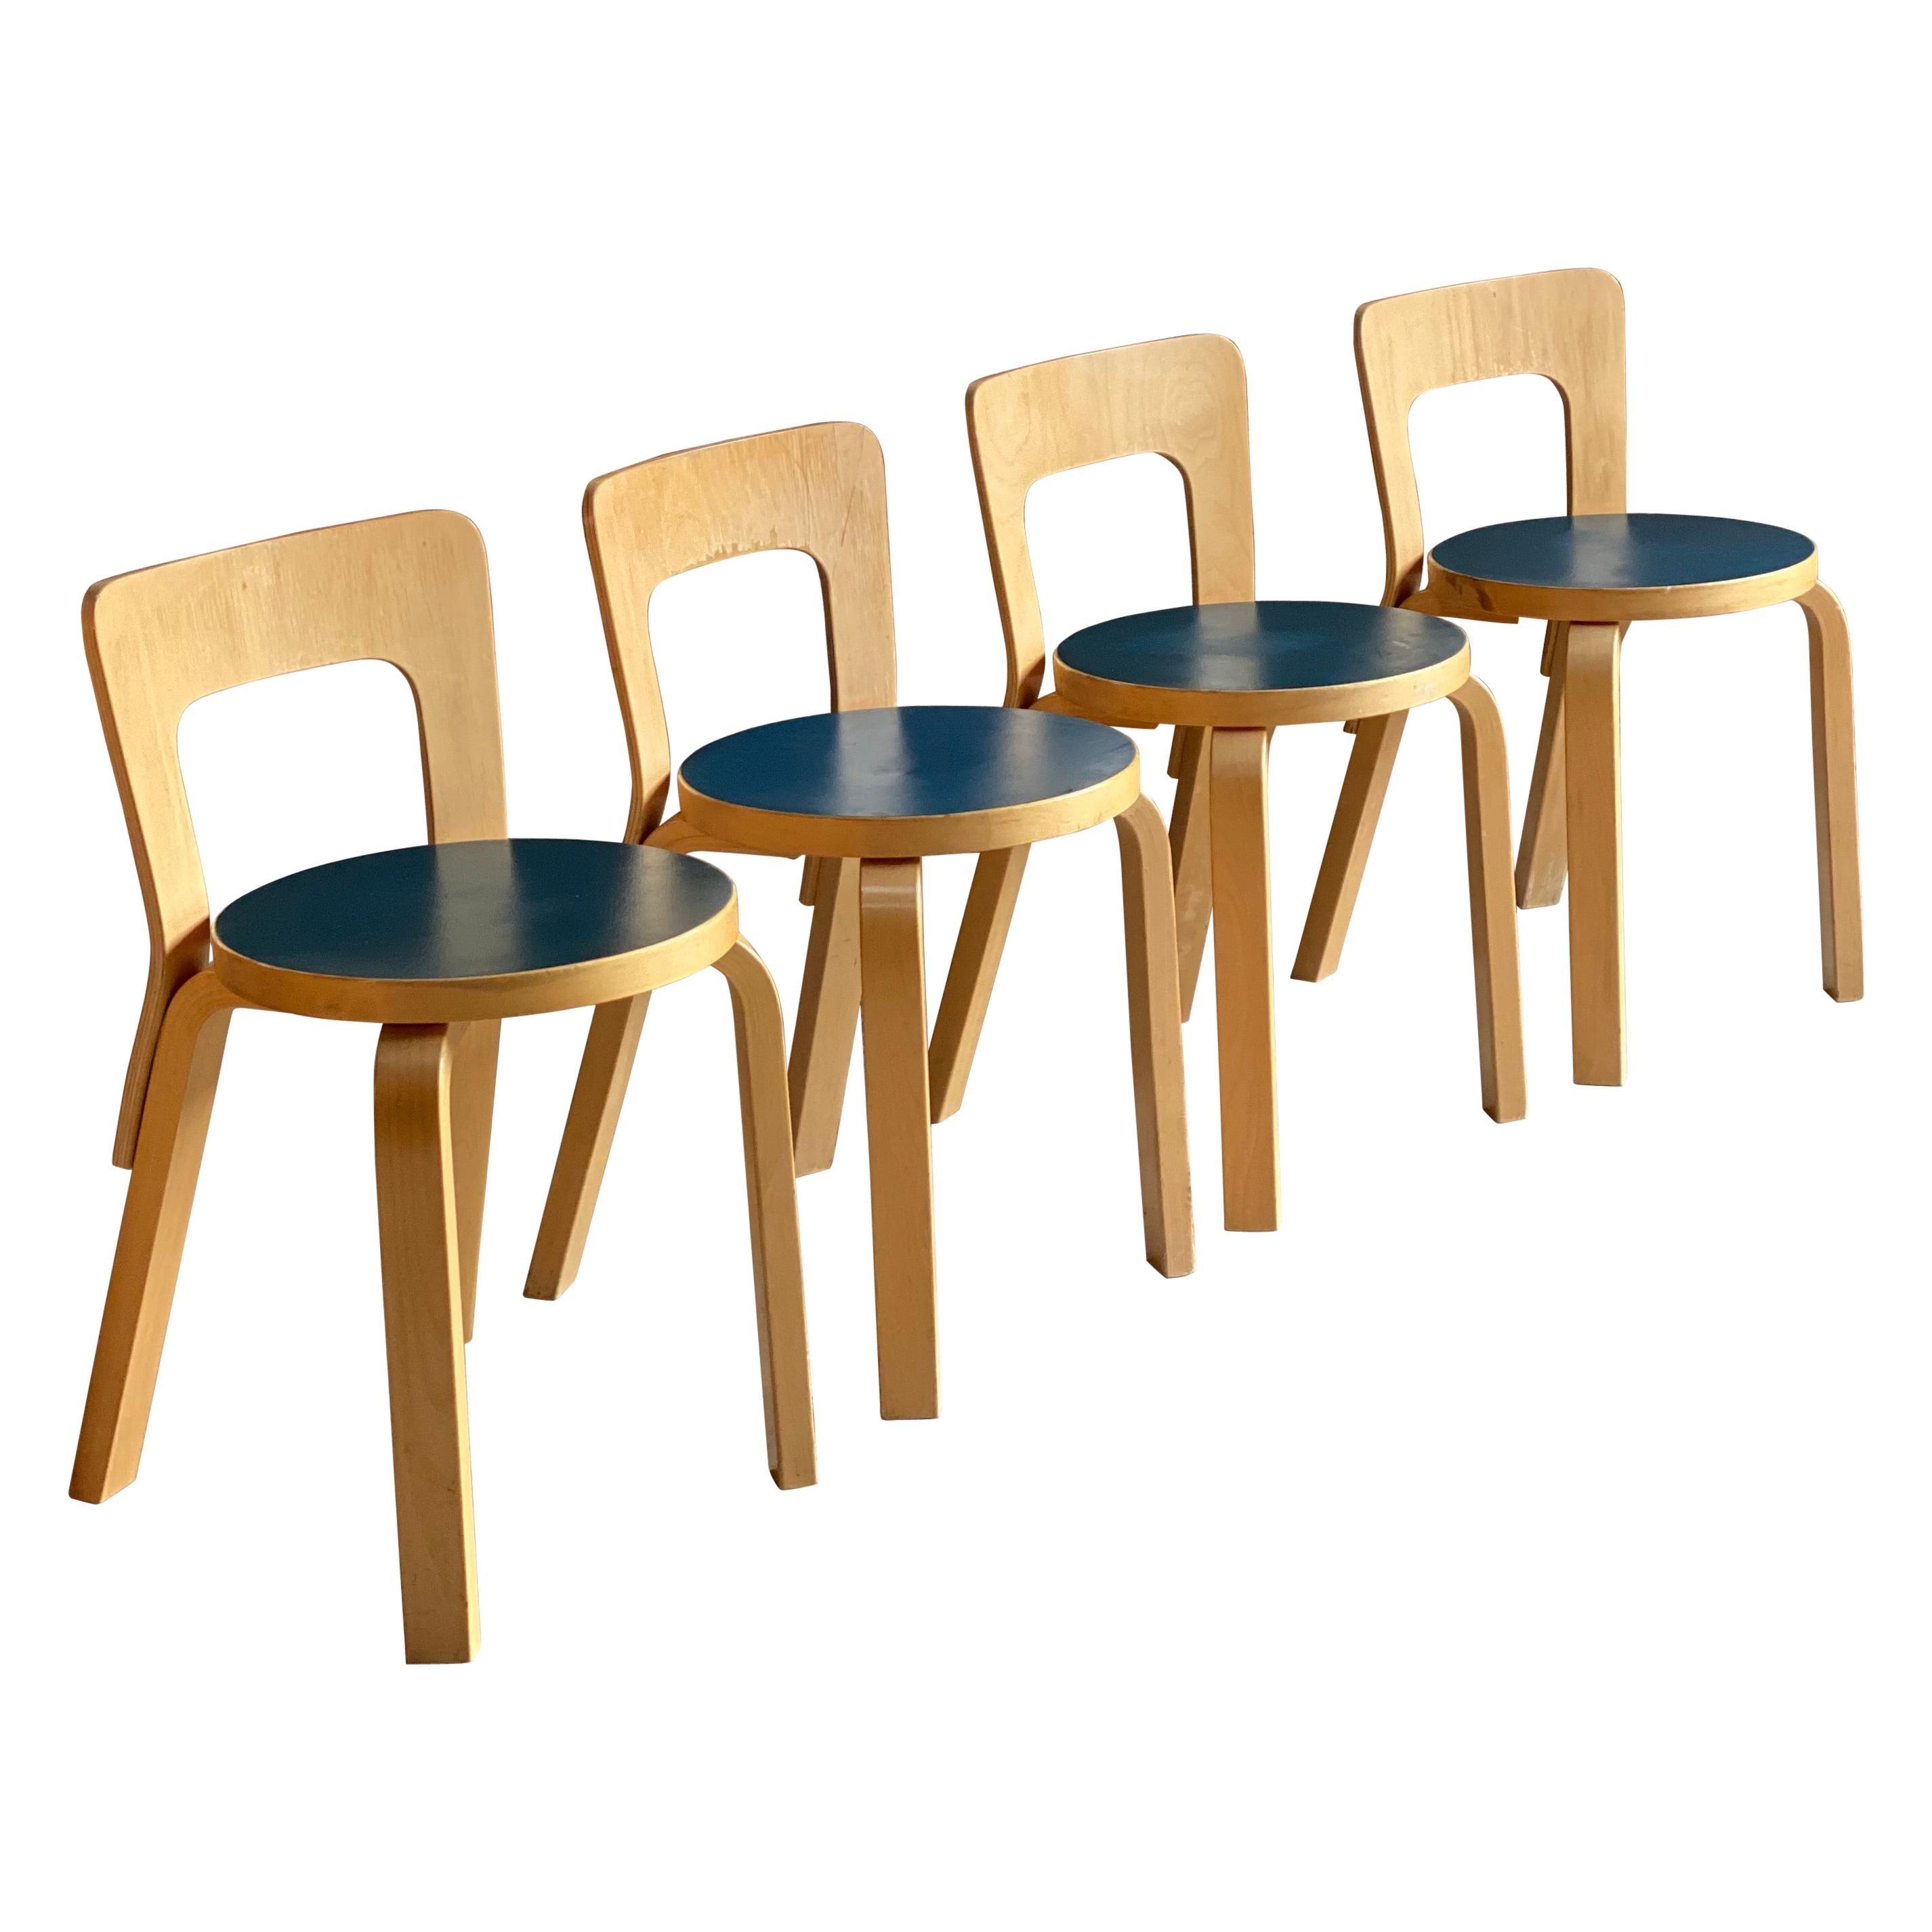 Alvar Aalto Model 65 Dining Chairs by Artek Finland, circa 1950s